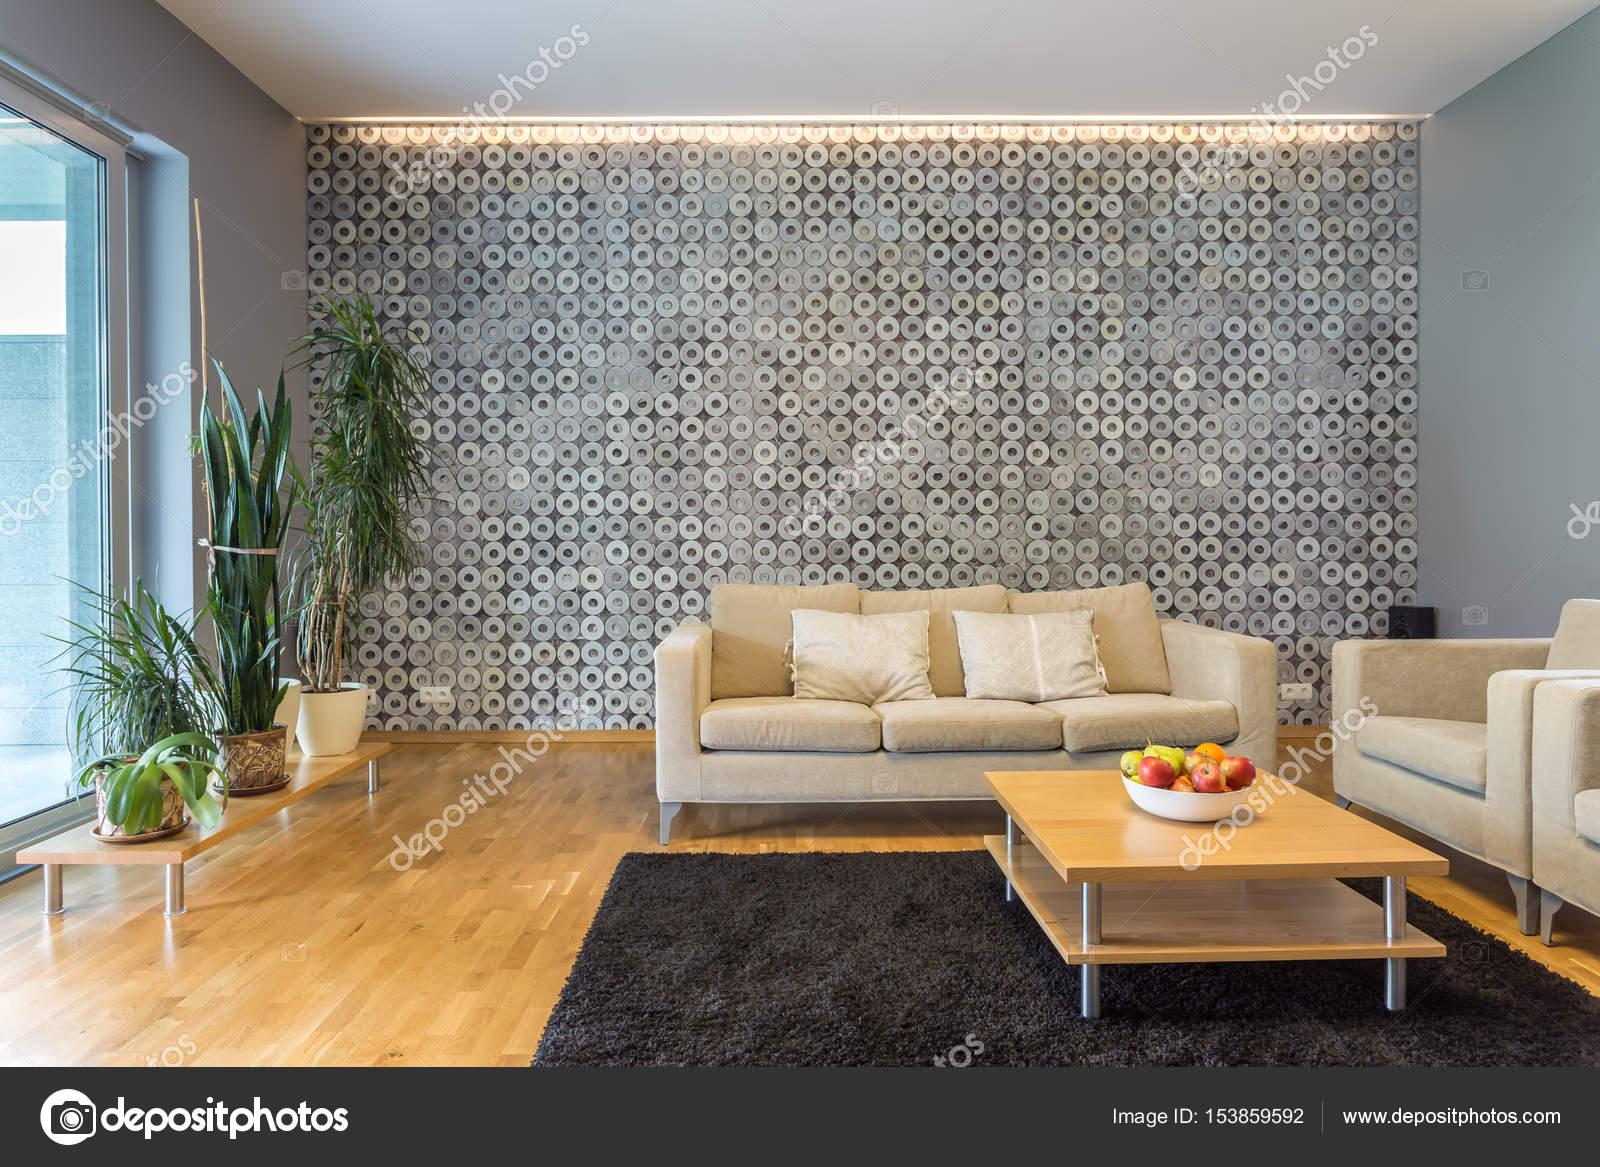 Woonkamer met moderne verlichting  Stockfoto